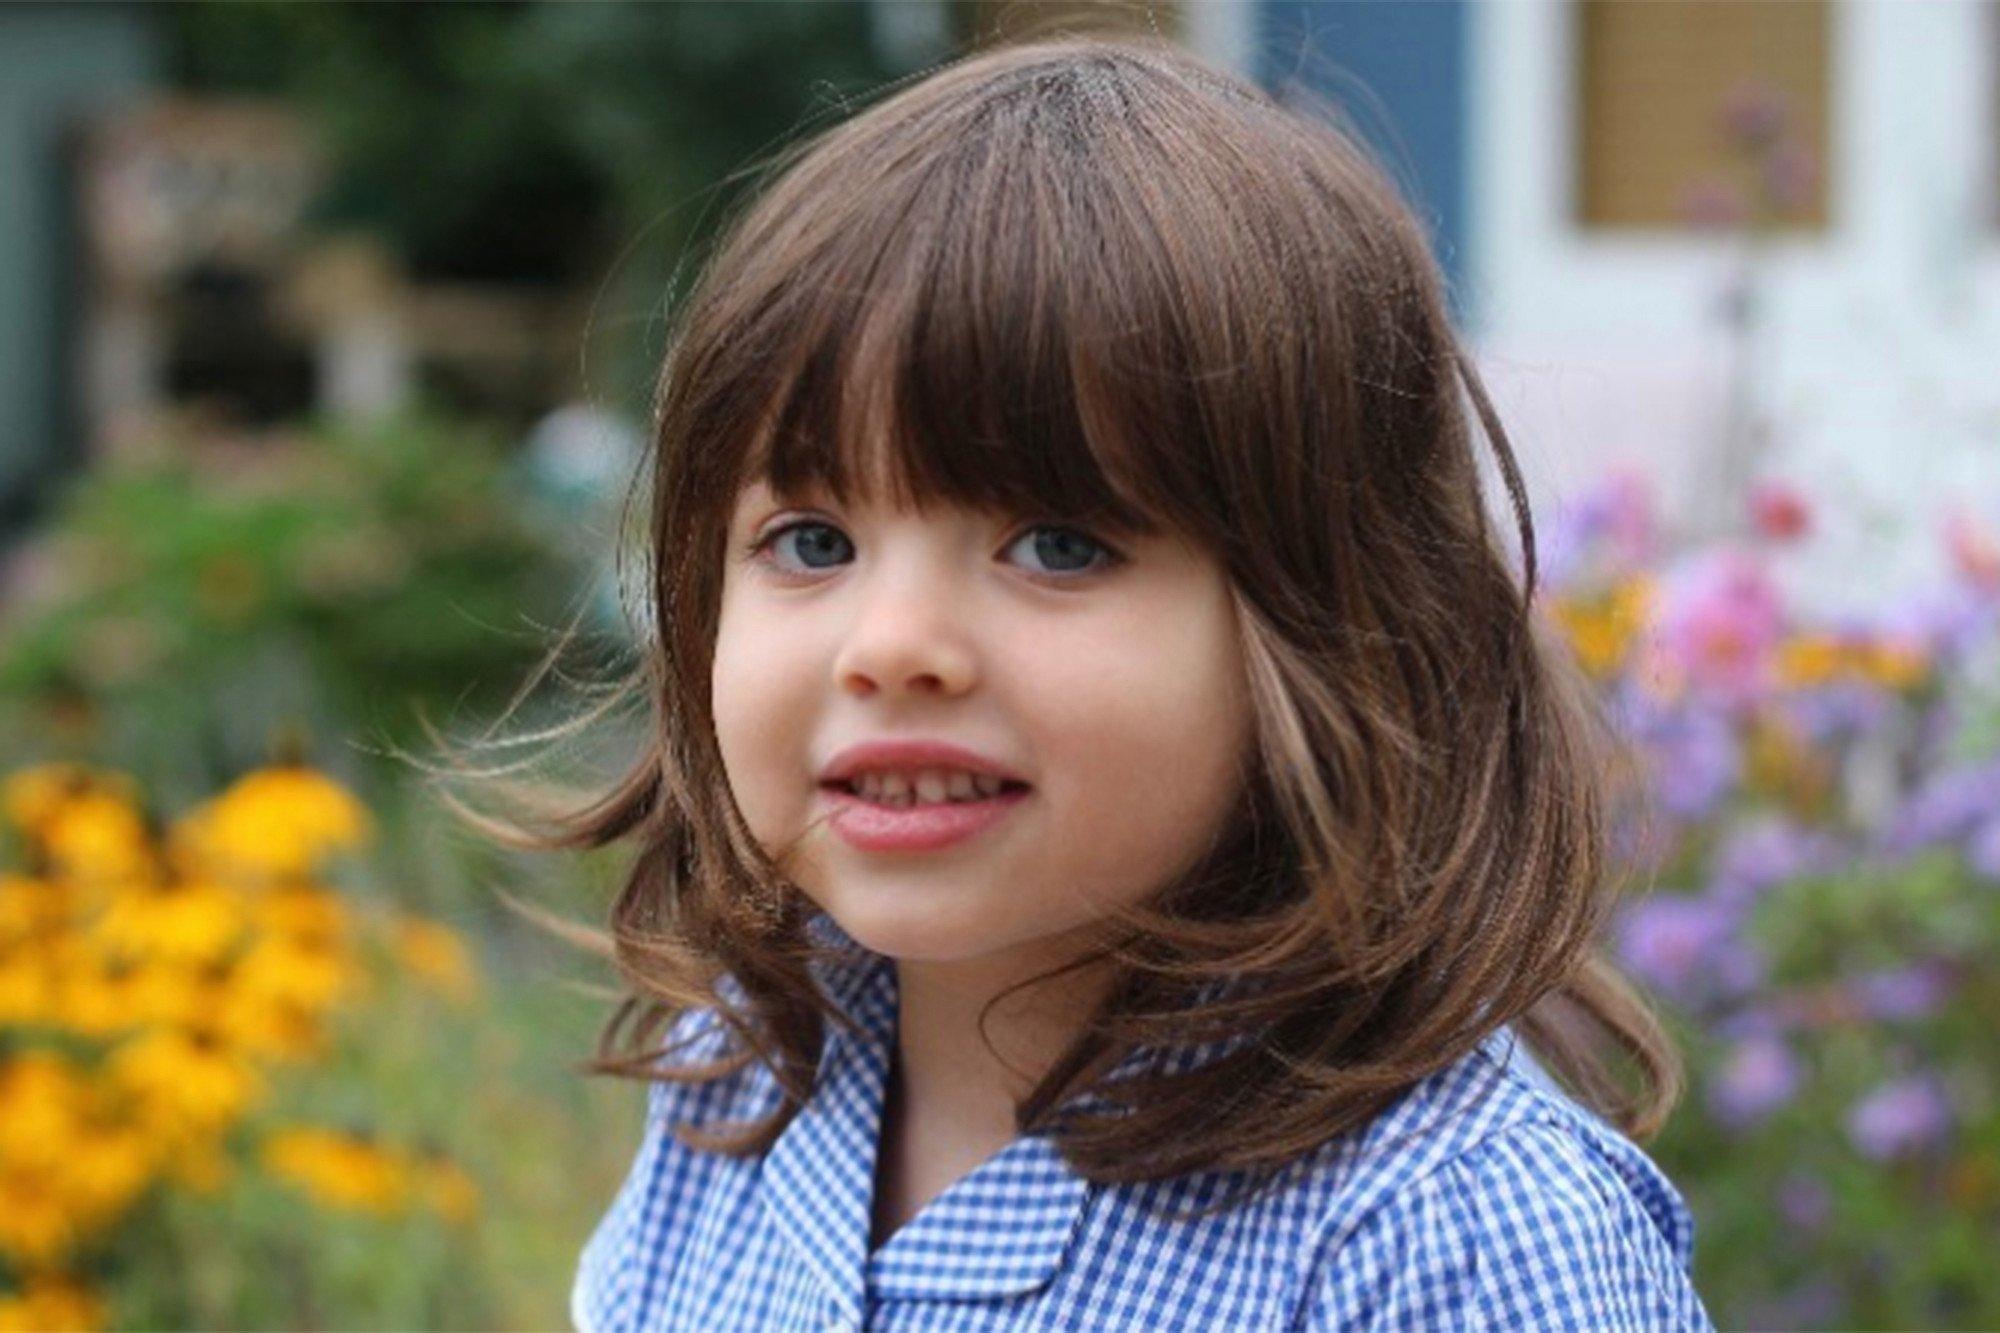 5-year-old girl dies after doctors dismiss appendicitis symptoms